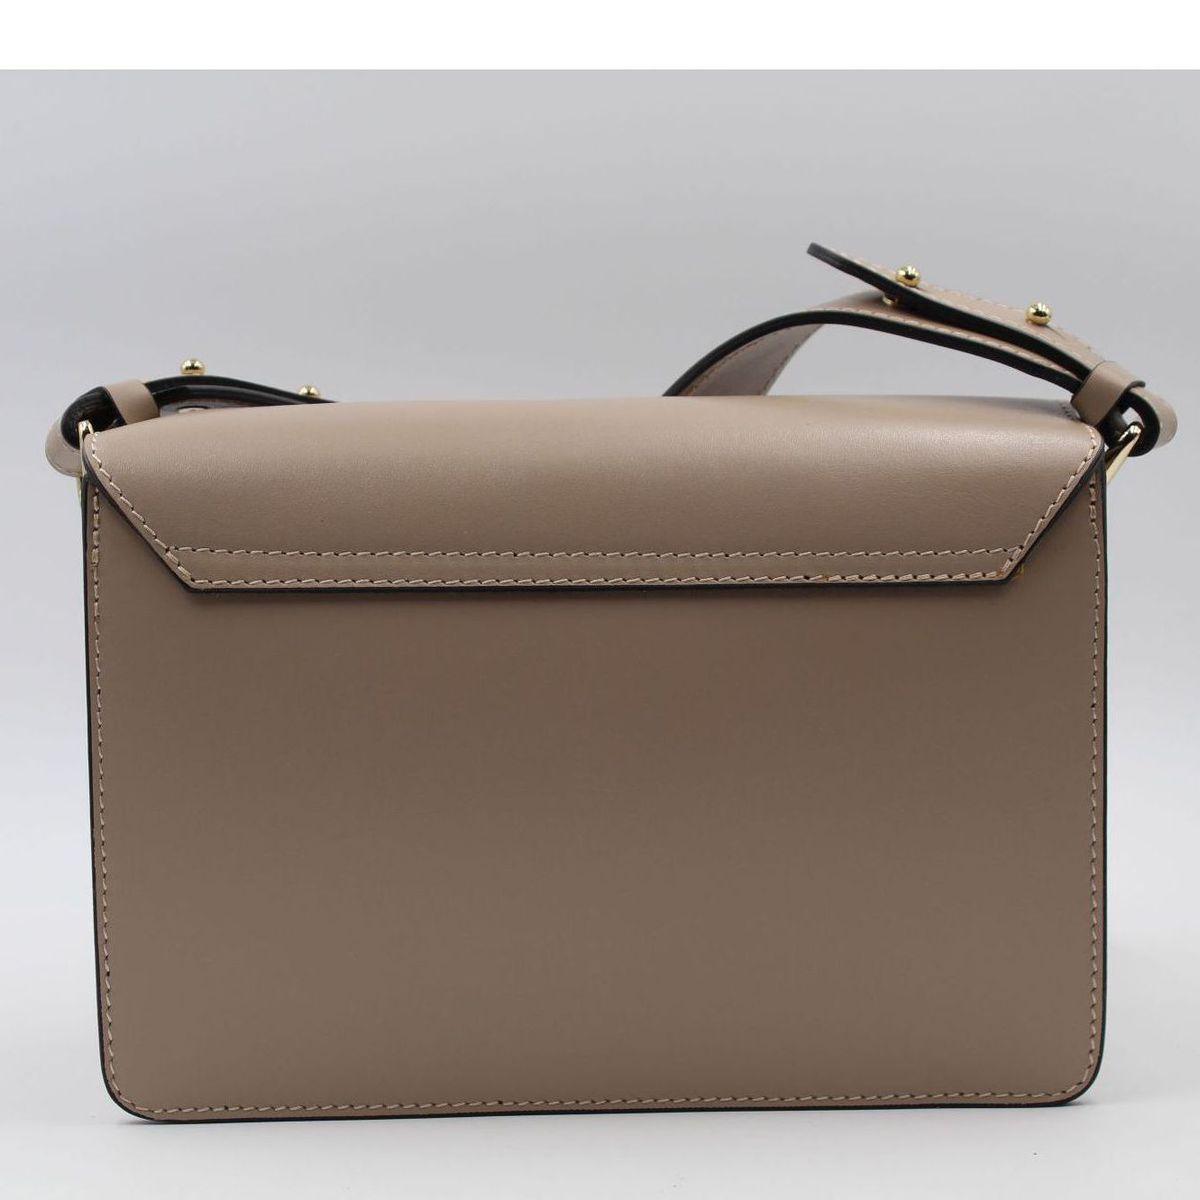 Kim leather bag Beige Avenue 67